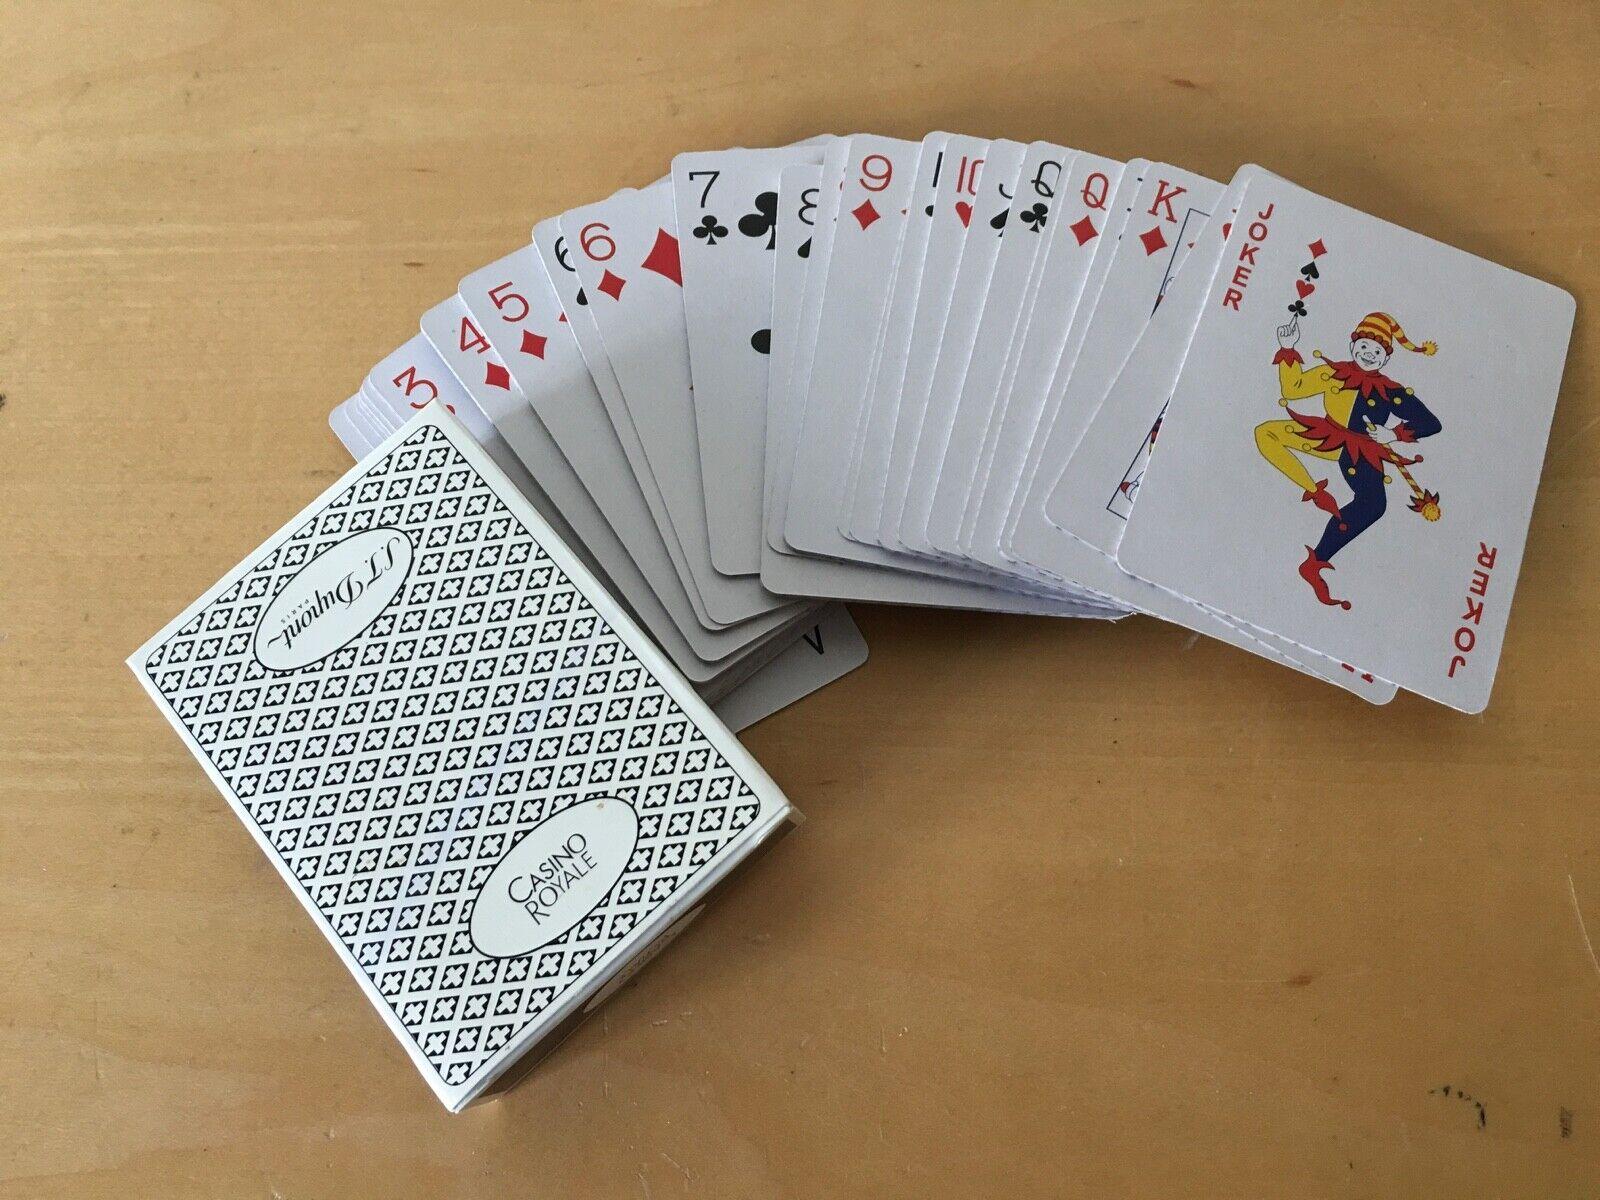 Neu - -spiel Spielkarte Poker S.T.Dupont Casino Royale Poker Card Game - Neu